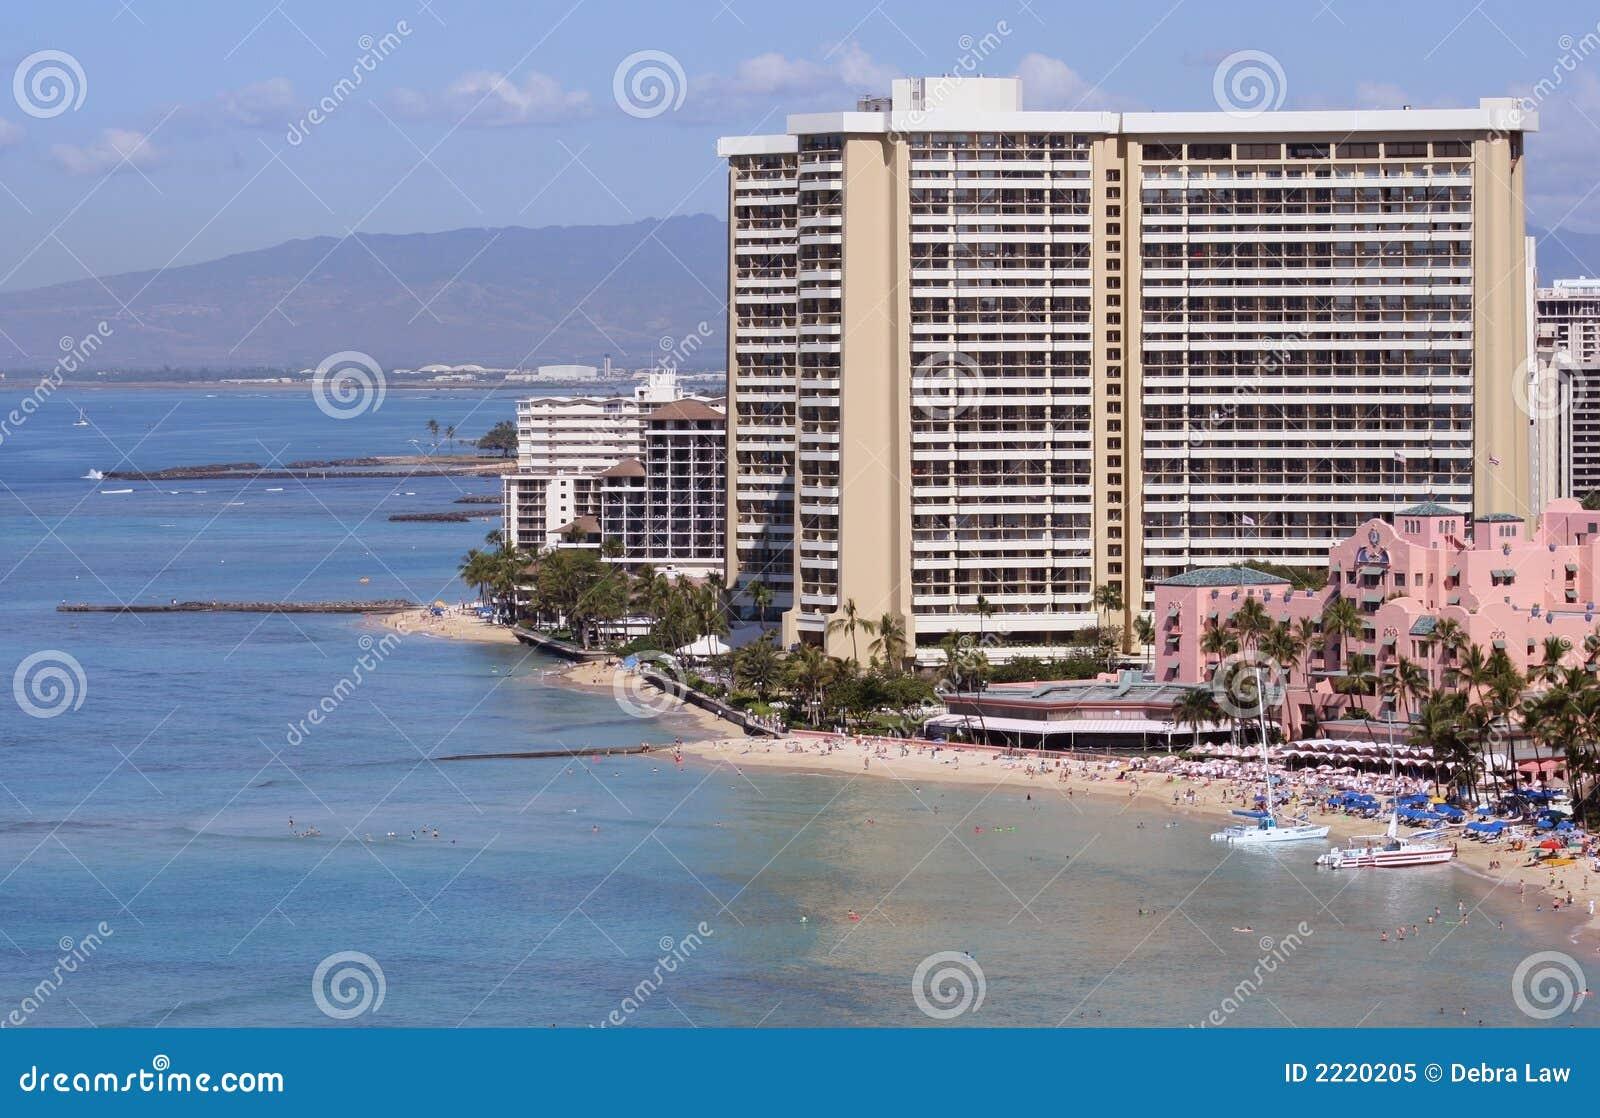 Hotel On Waikiki Beach Hawaii Usa Stock Image Image Of